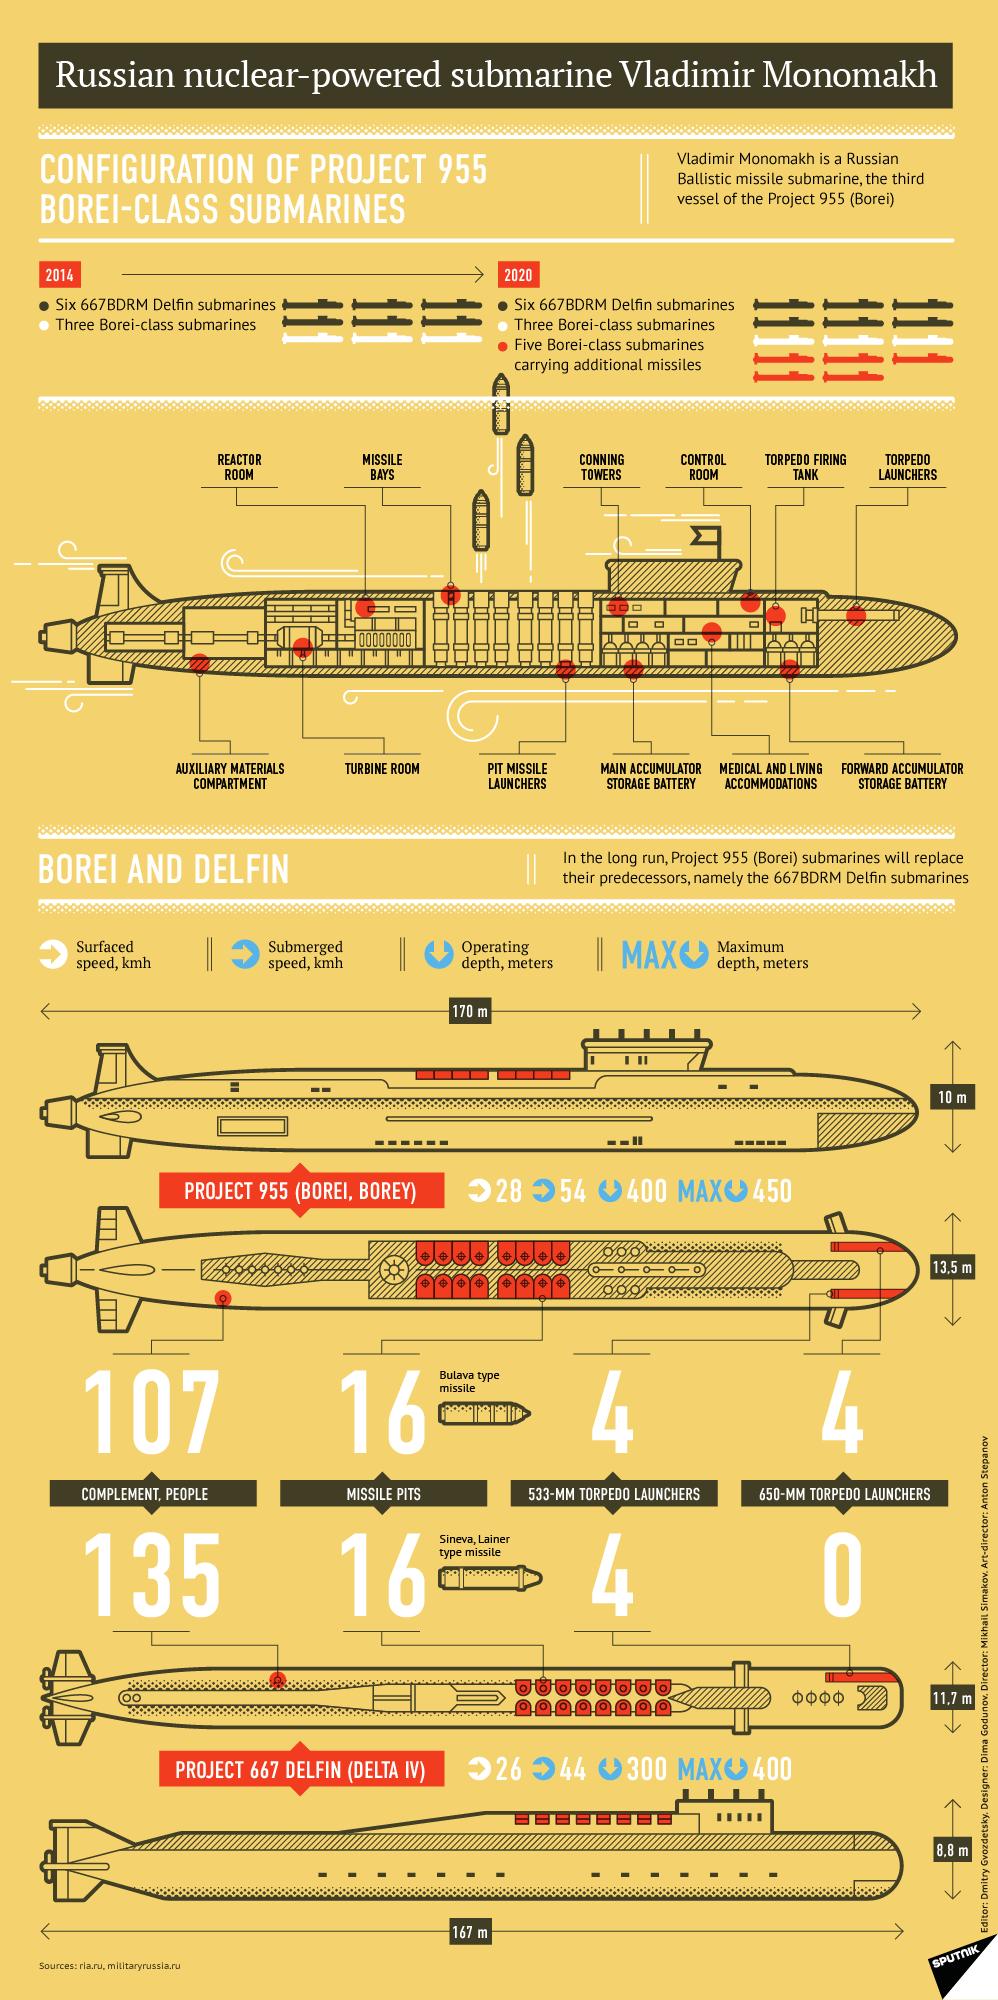 Russian nuclear-powered submarine Vladimir Monomakh